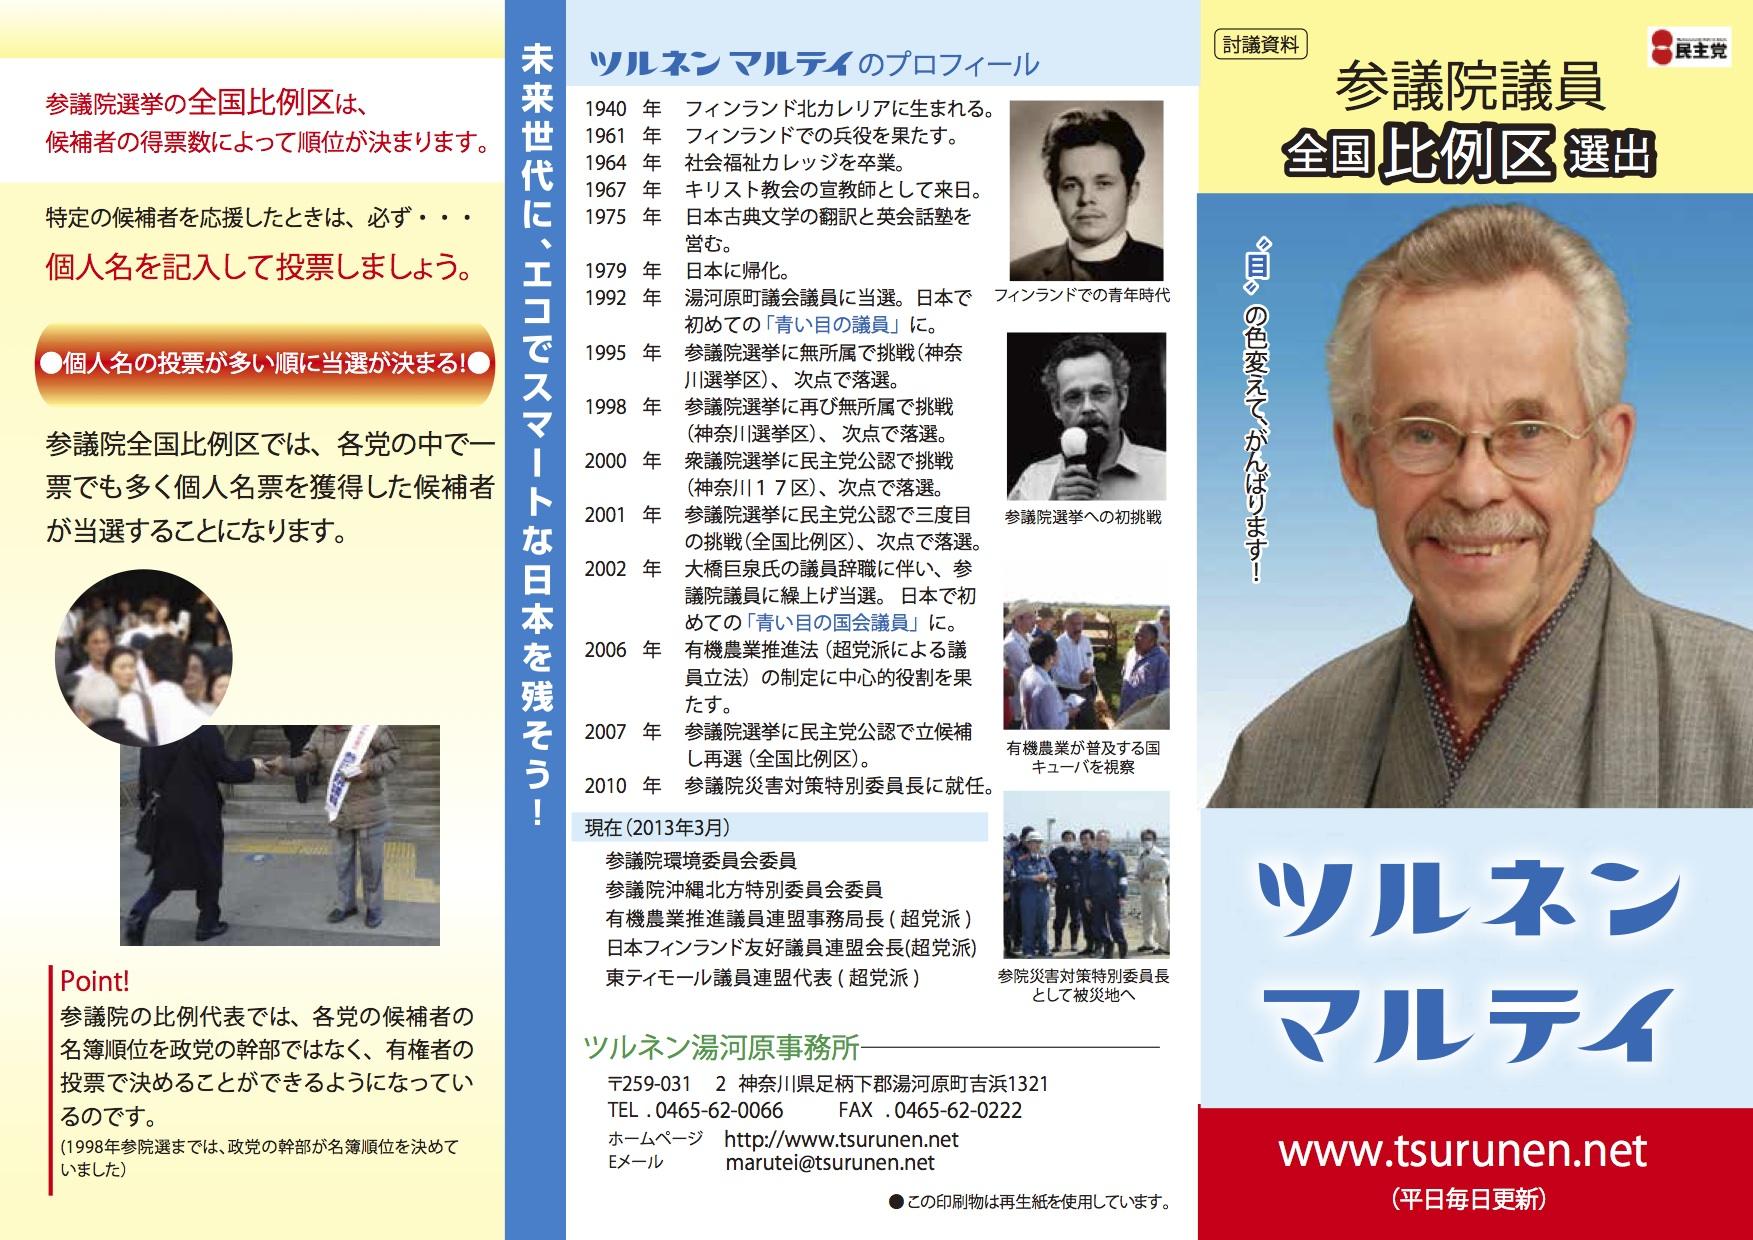 tsurunenmarutei2013pamphlet